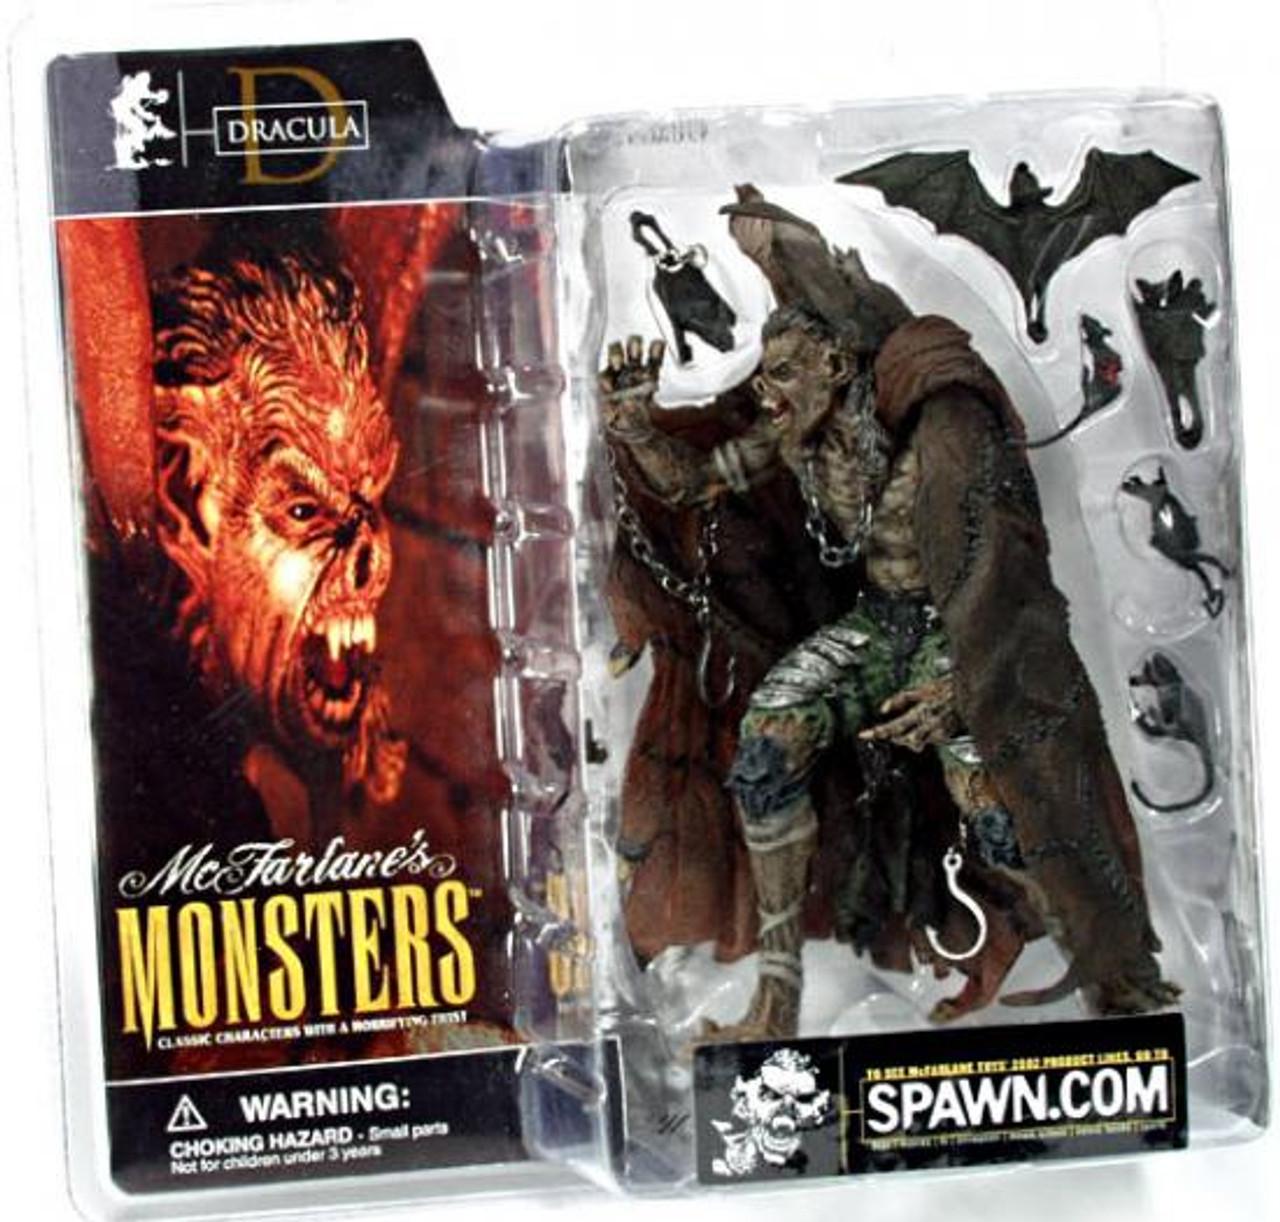 McFarlane Toys McFarlane's Monsters Dracula Action Figure [Clean Package]